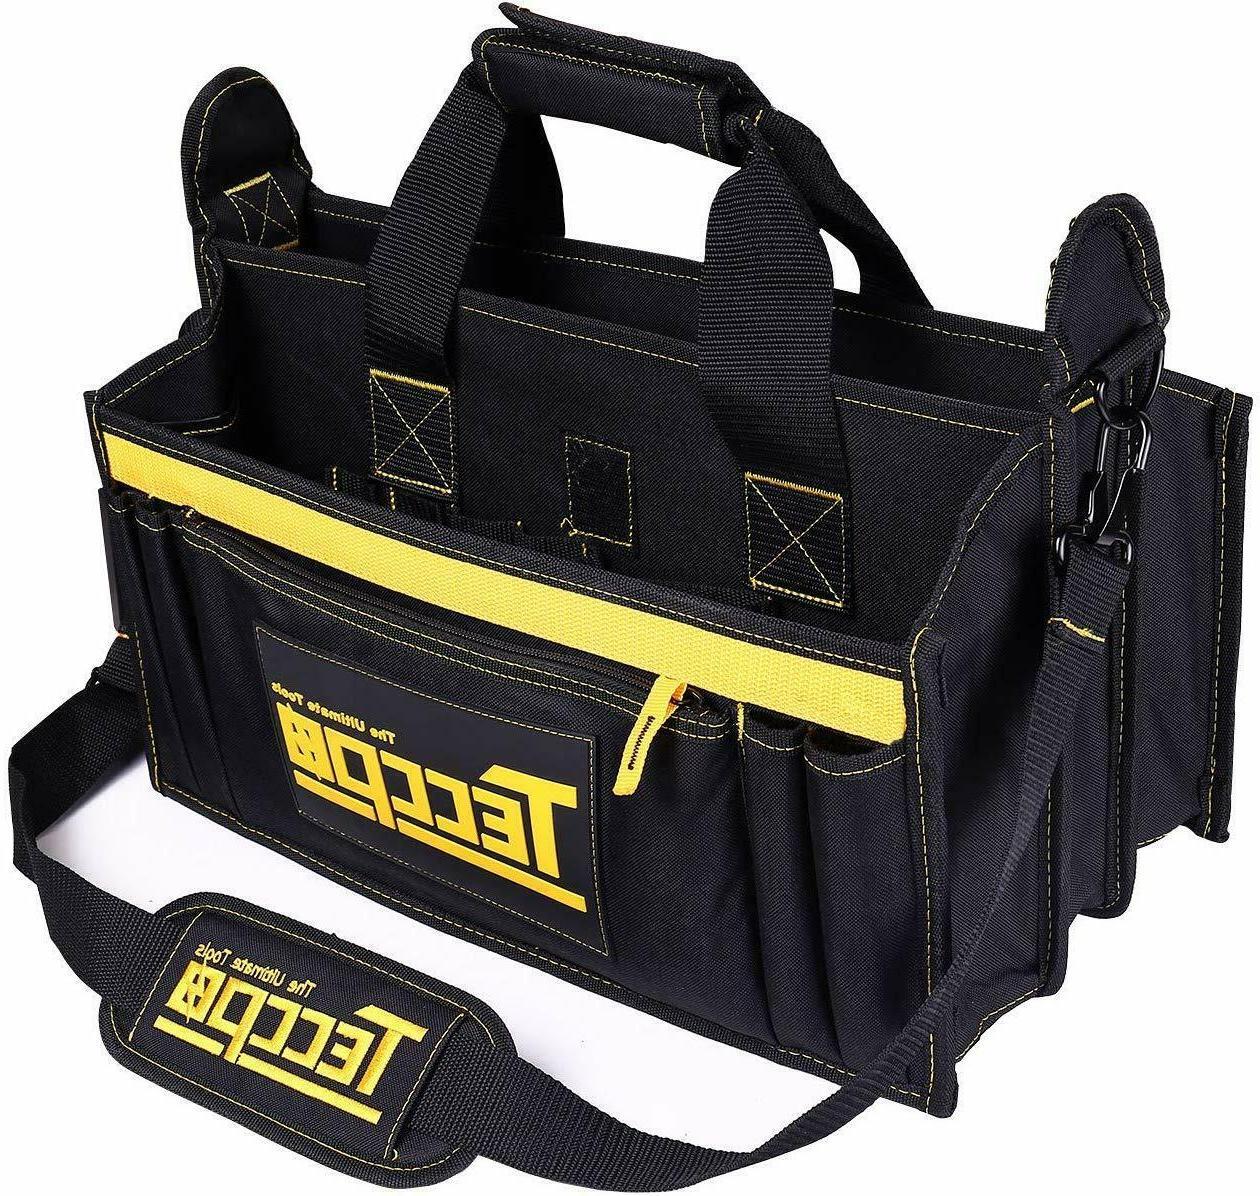 tool bag heavy duty bag 3 max